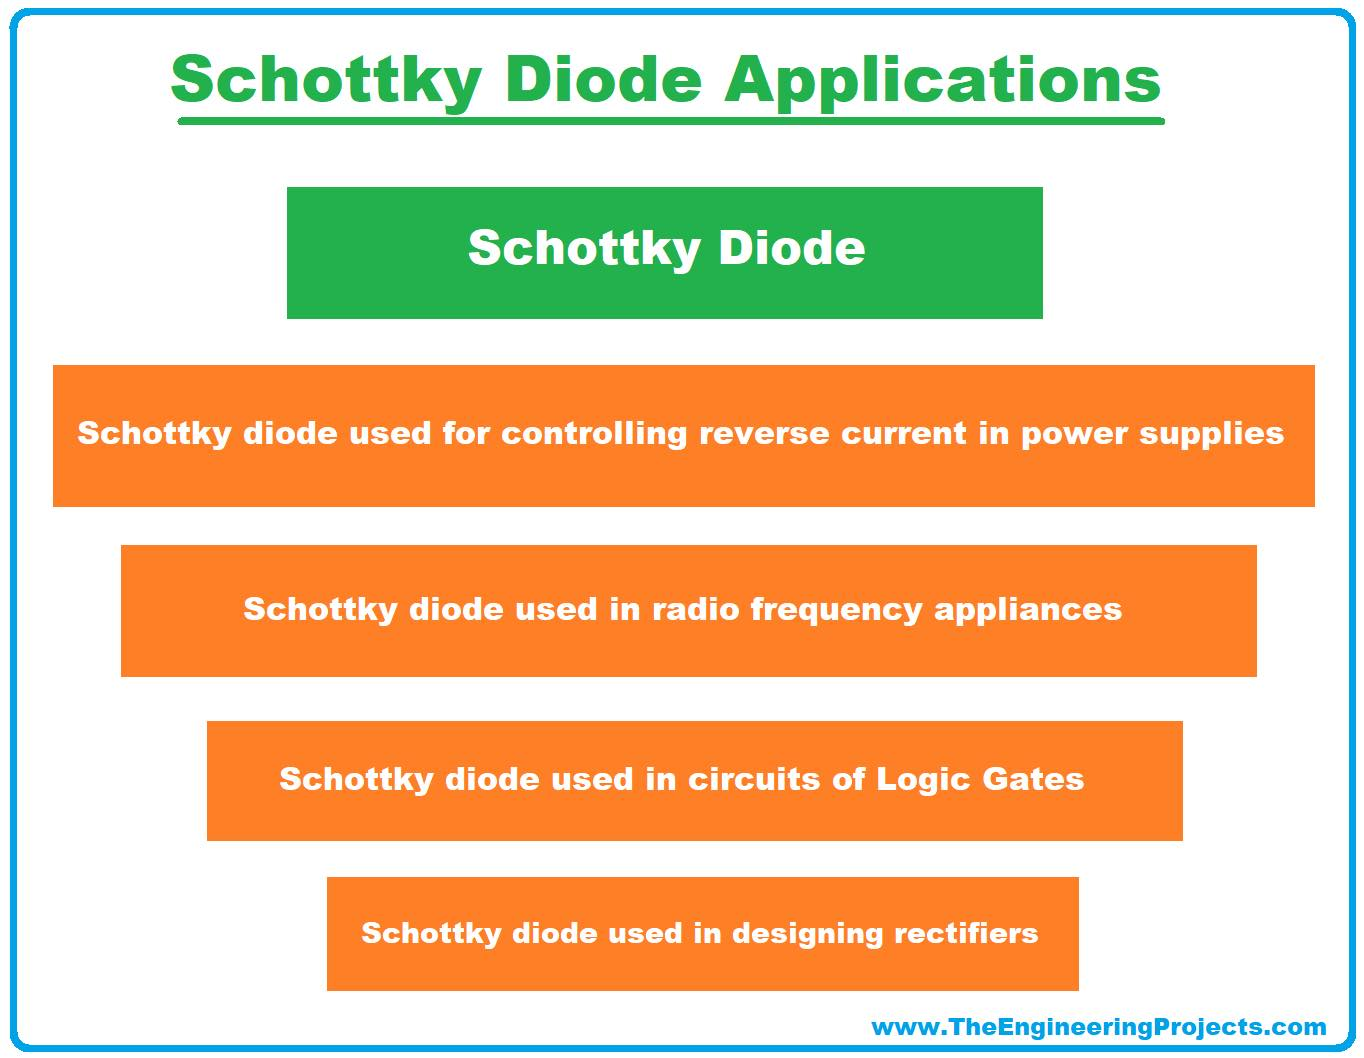 Schottky Diode, Schottky barrier diode, Schottky barrier, Schottky Diode working, Schottky Diode application, applications of Schottky Diode, Schottky Diode advantages, advantages of schottky diode